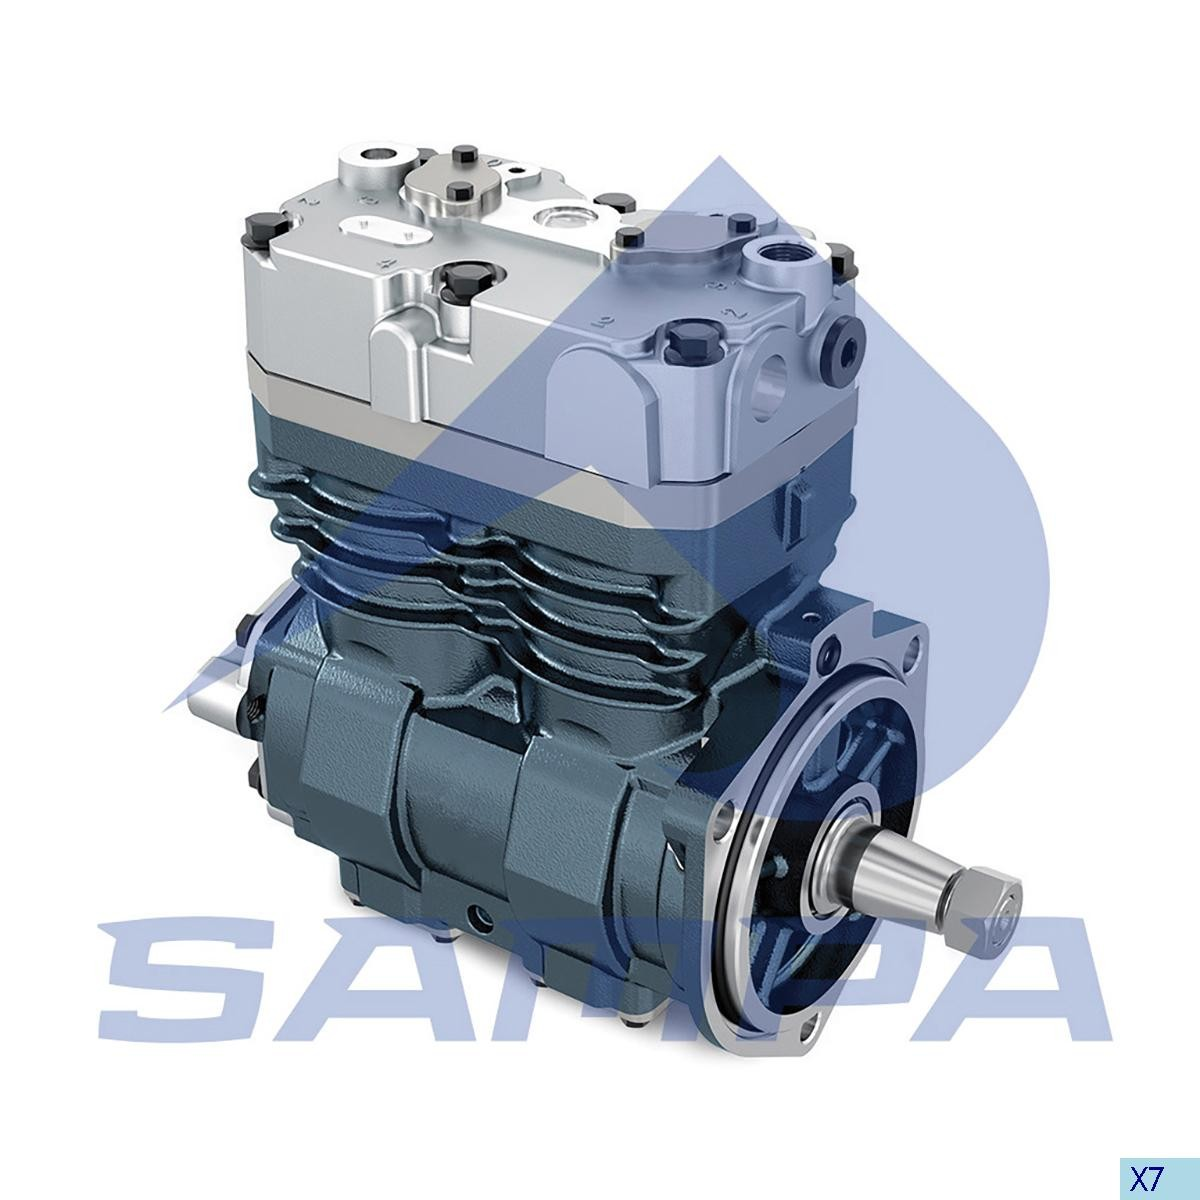 Compressor Iveco Stralis Knorr LP4936 photo